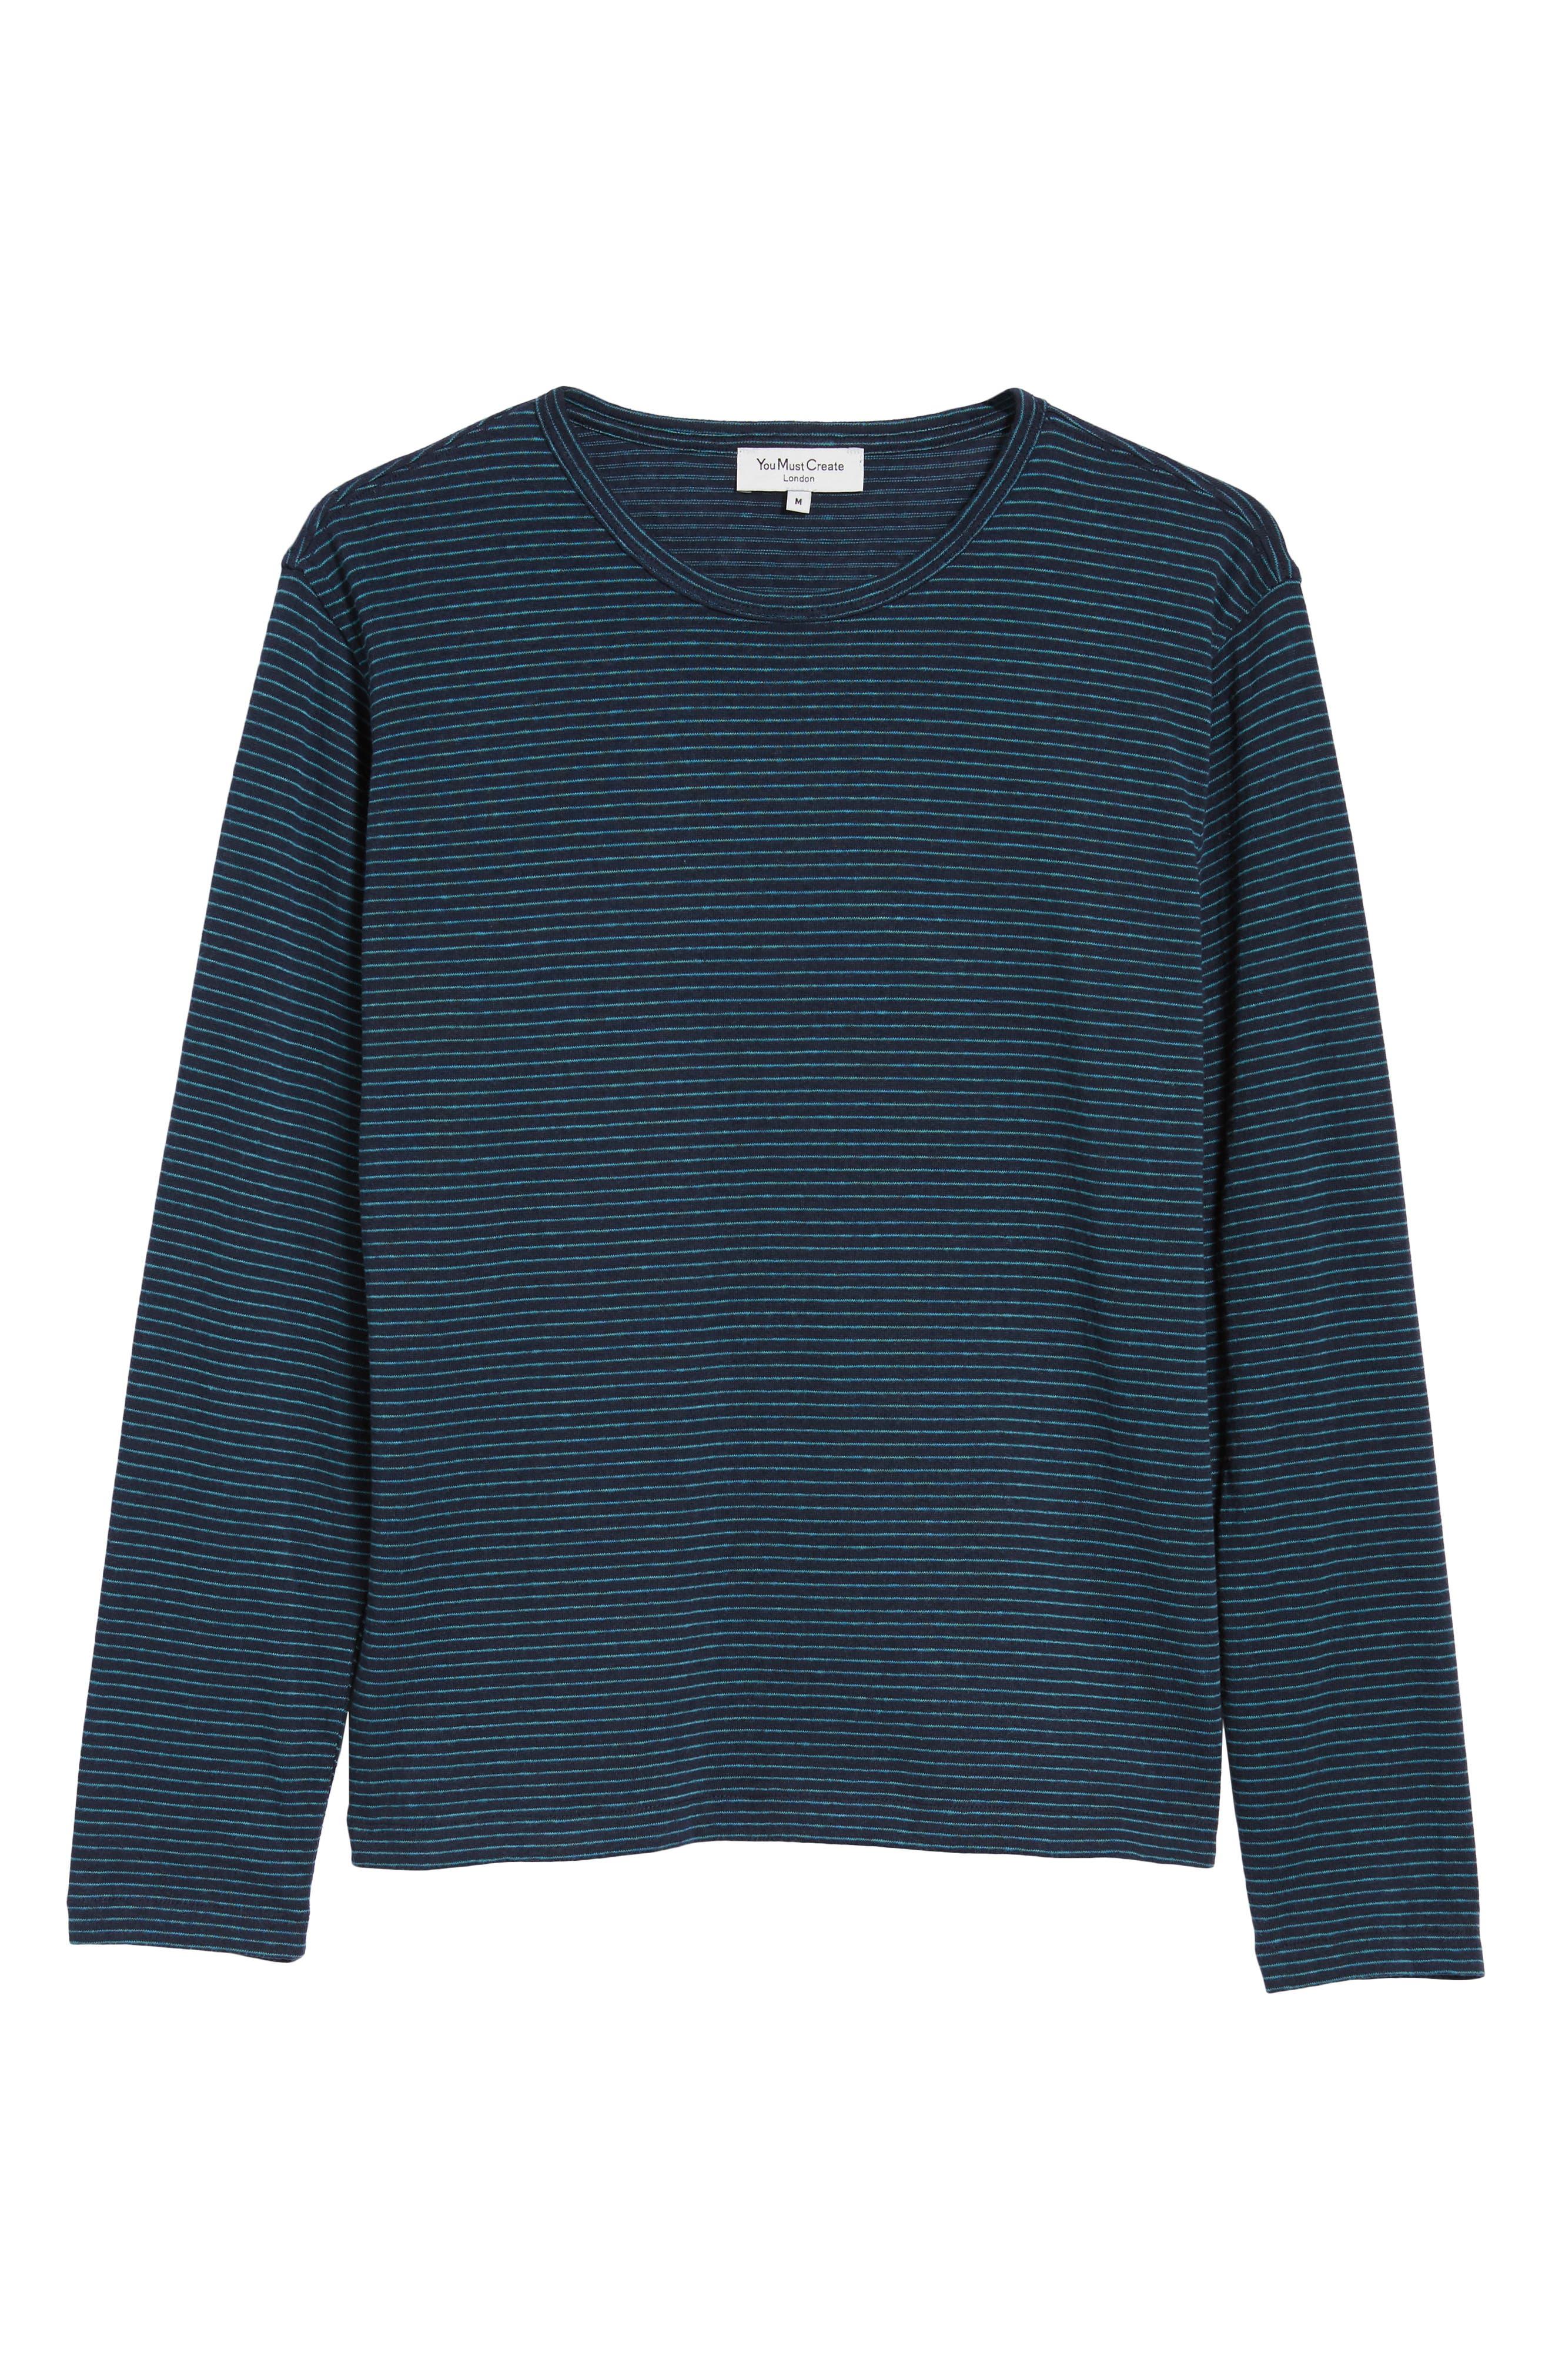 Narrow Stripe Long Sleeve T-Shirt,                             Alternate thumbnail 6, color,                             NAVY/ BLUE